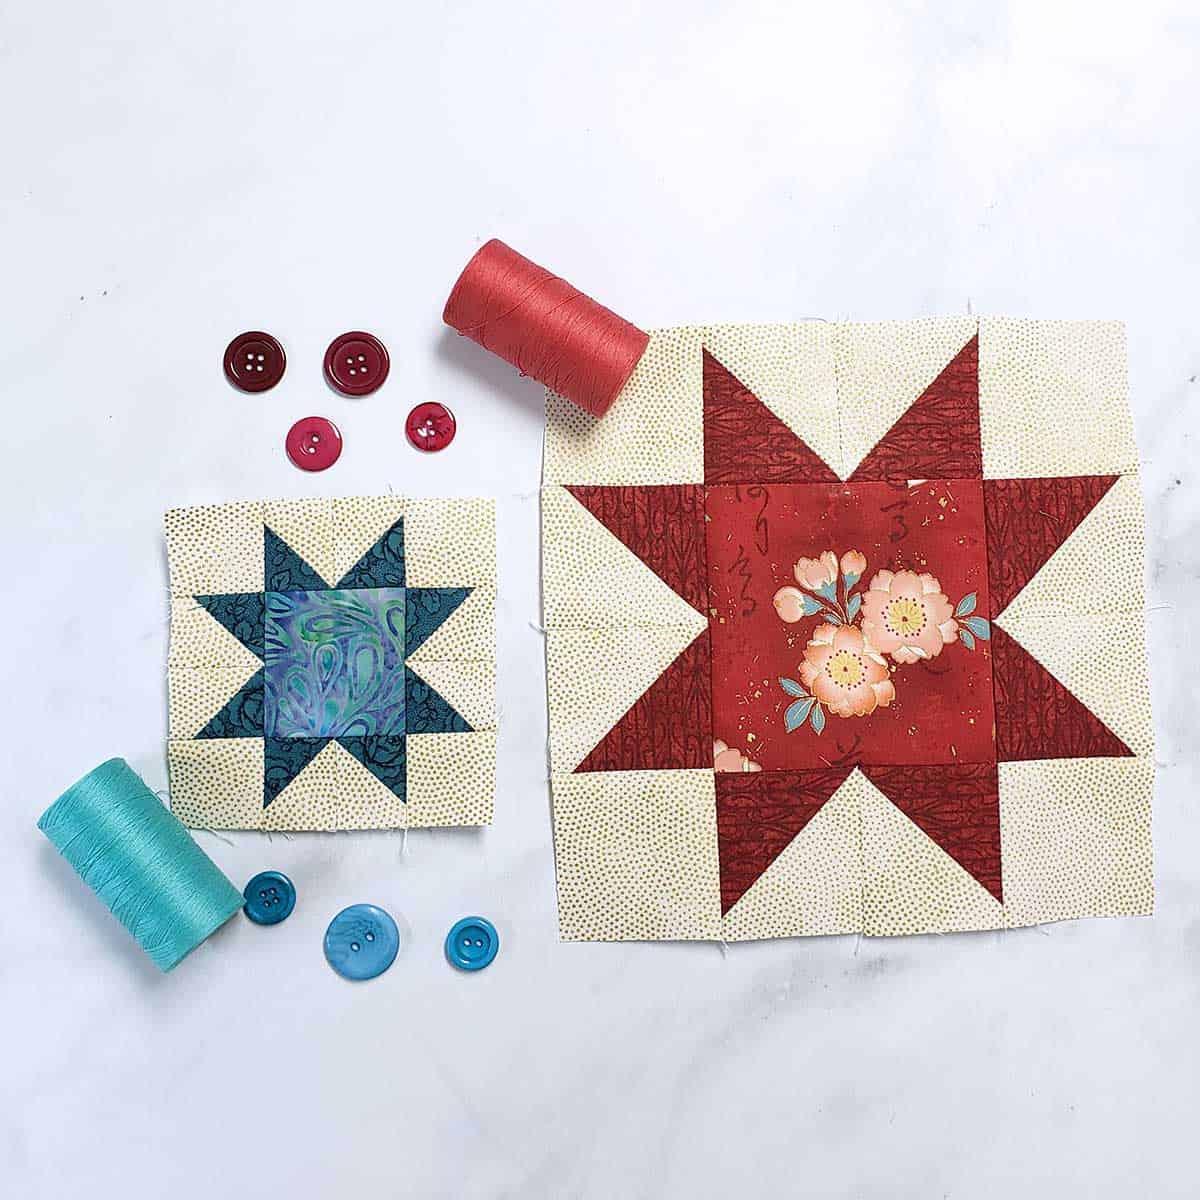 2 sizes of sawtooth star blocks